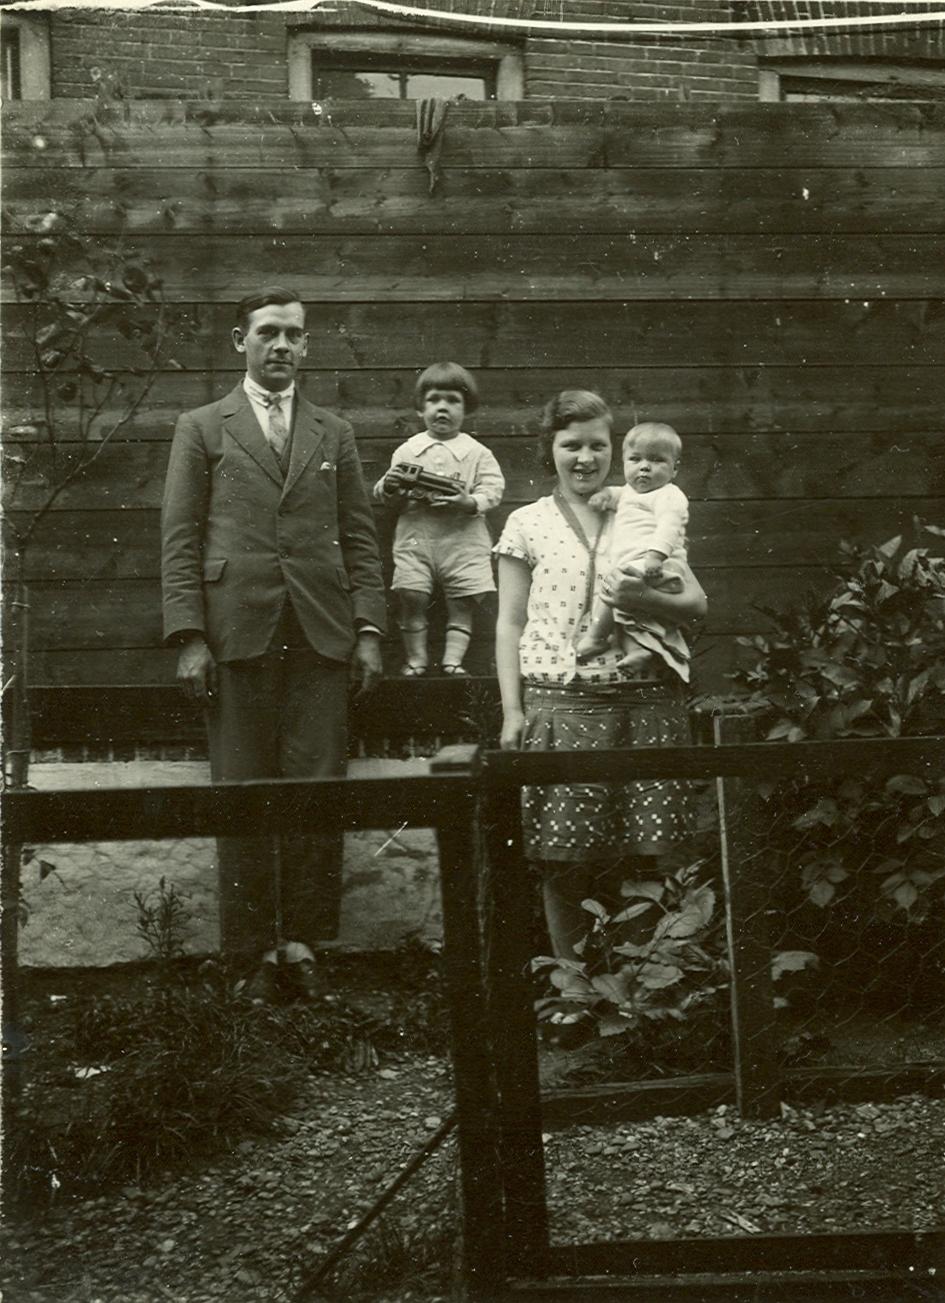 Jillis Adrianus Brouwer (1903-1984), Jillis Adrianus Brouwer (1926-1977), Barbara Margaretha Schoots (1906-1991), Marinus Maria Brouwer (1927-2017)